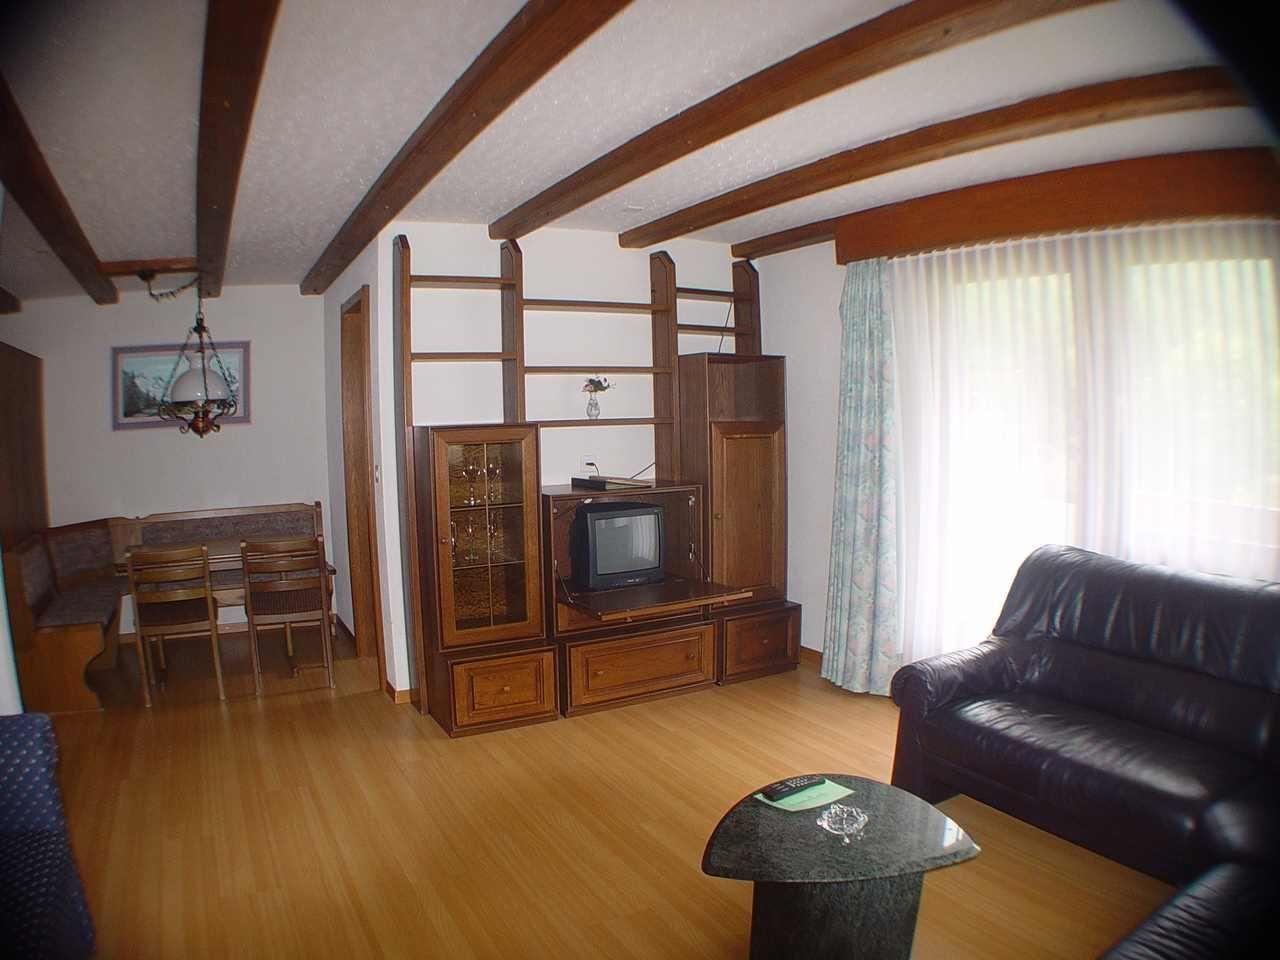 App 25 Zimmer